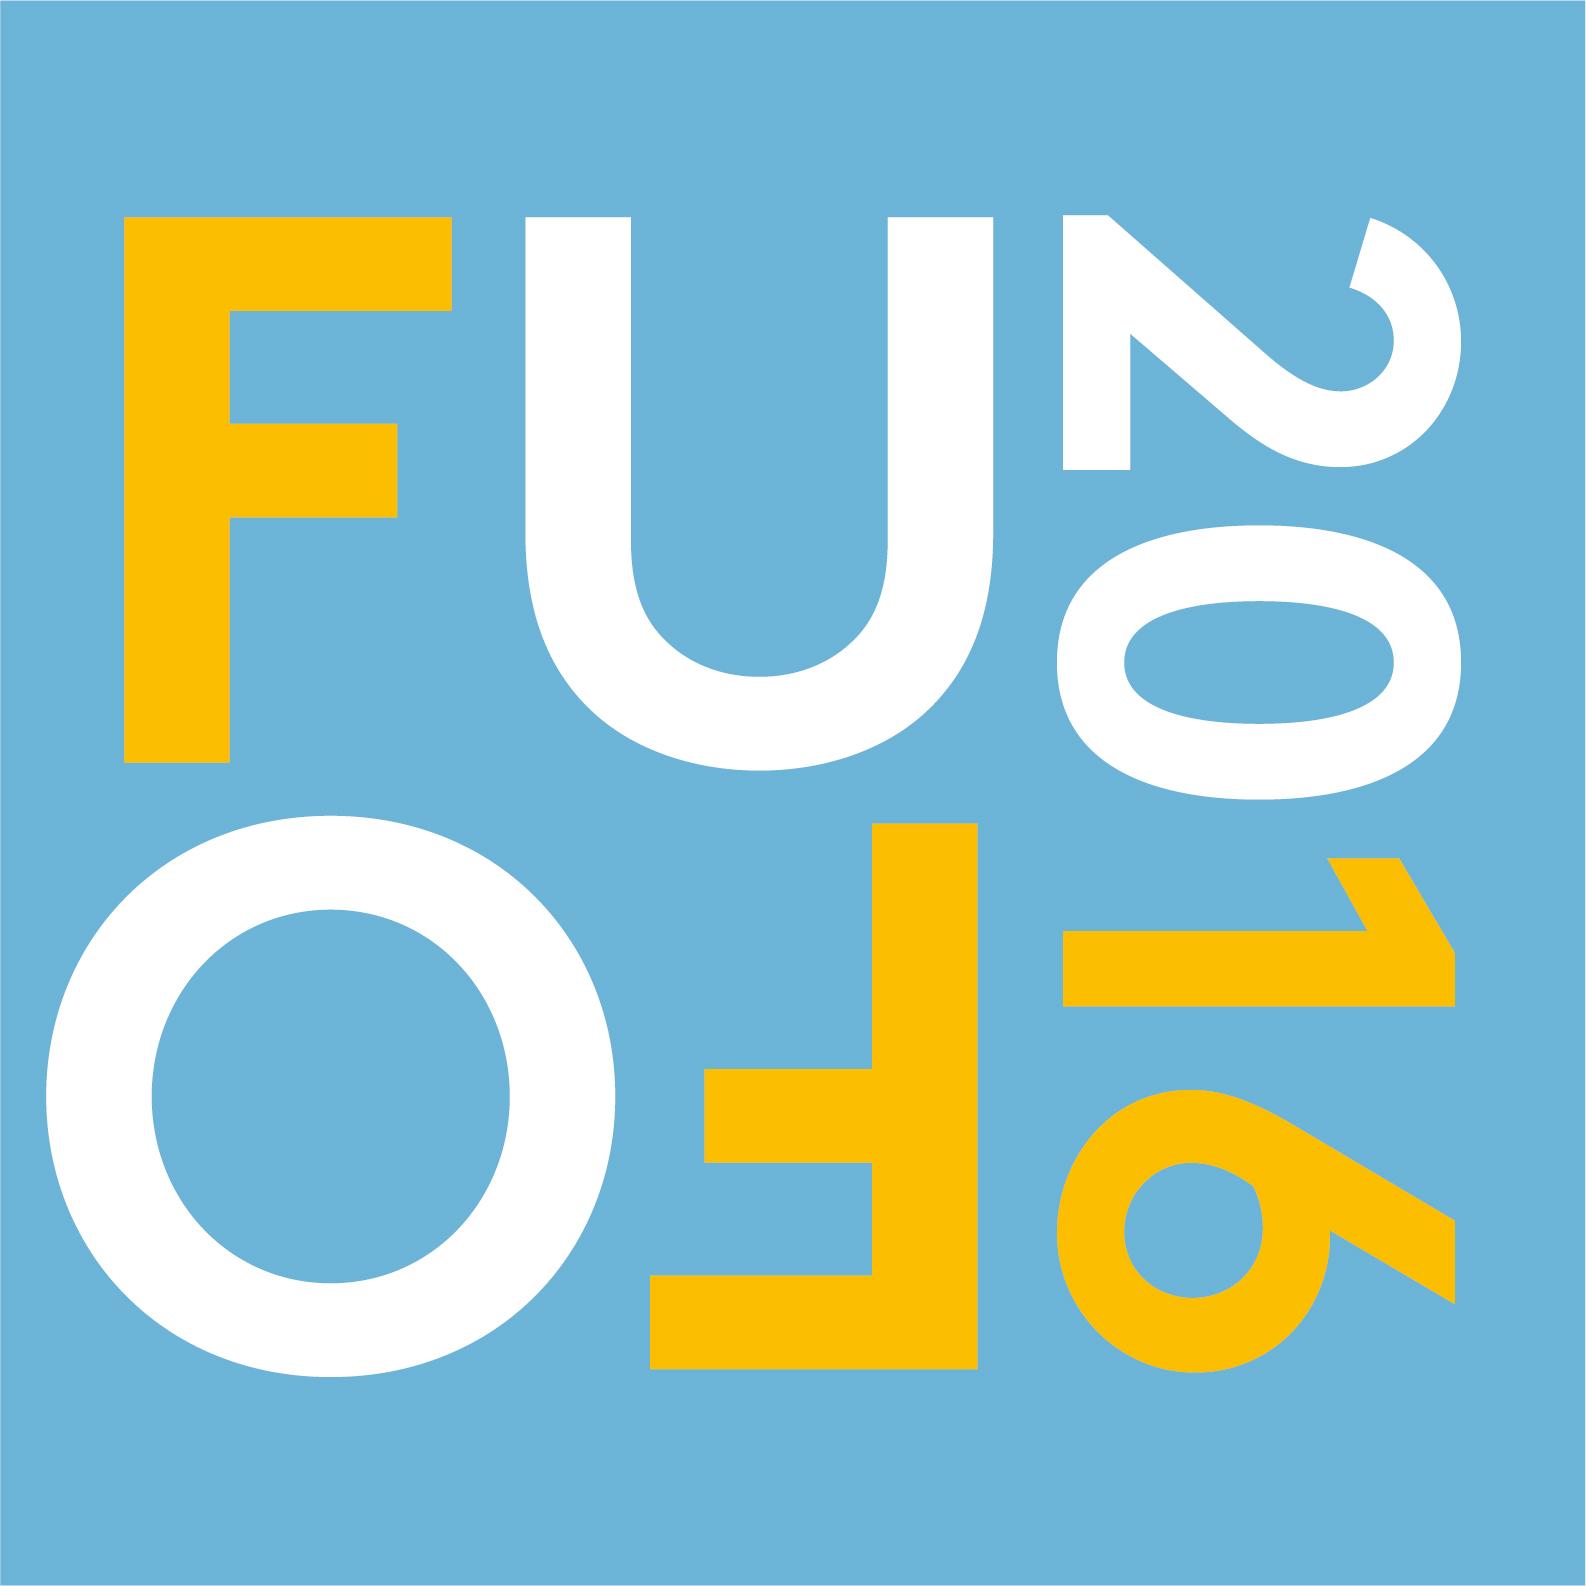 Future Forum 2016/14 Le parole chiave del Future Forum udinese